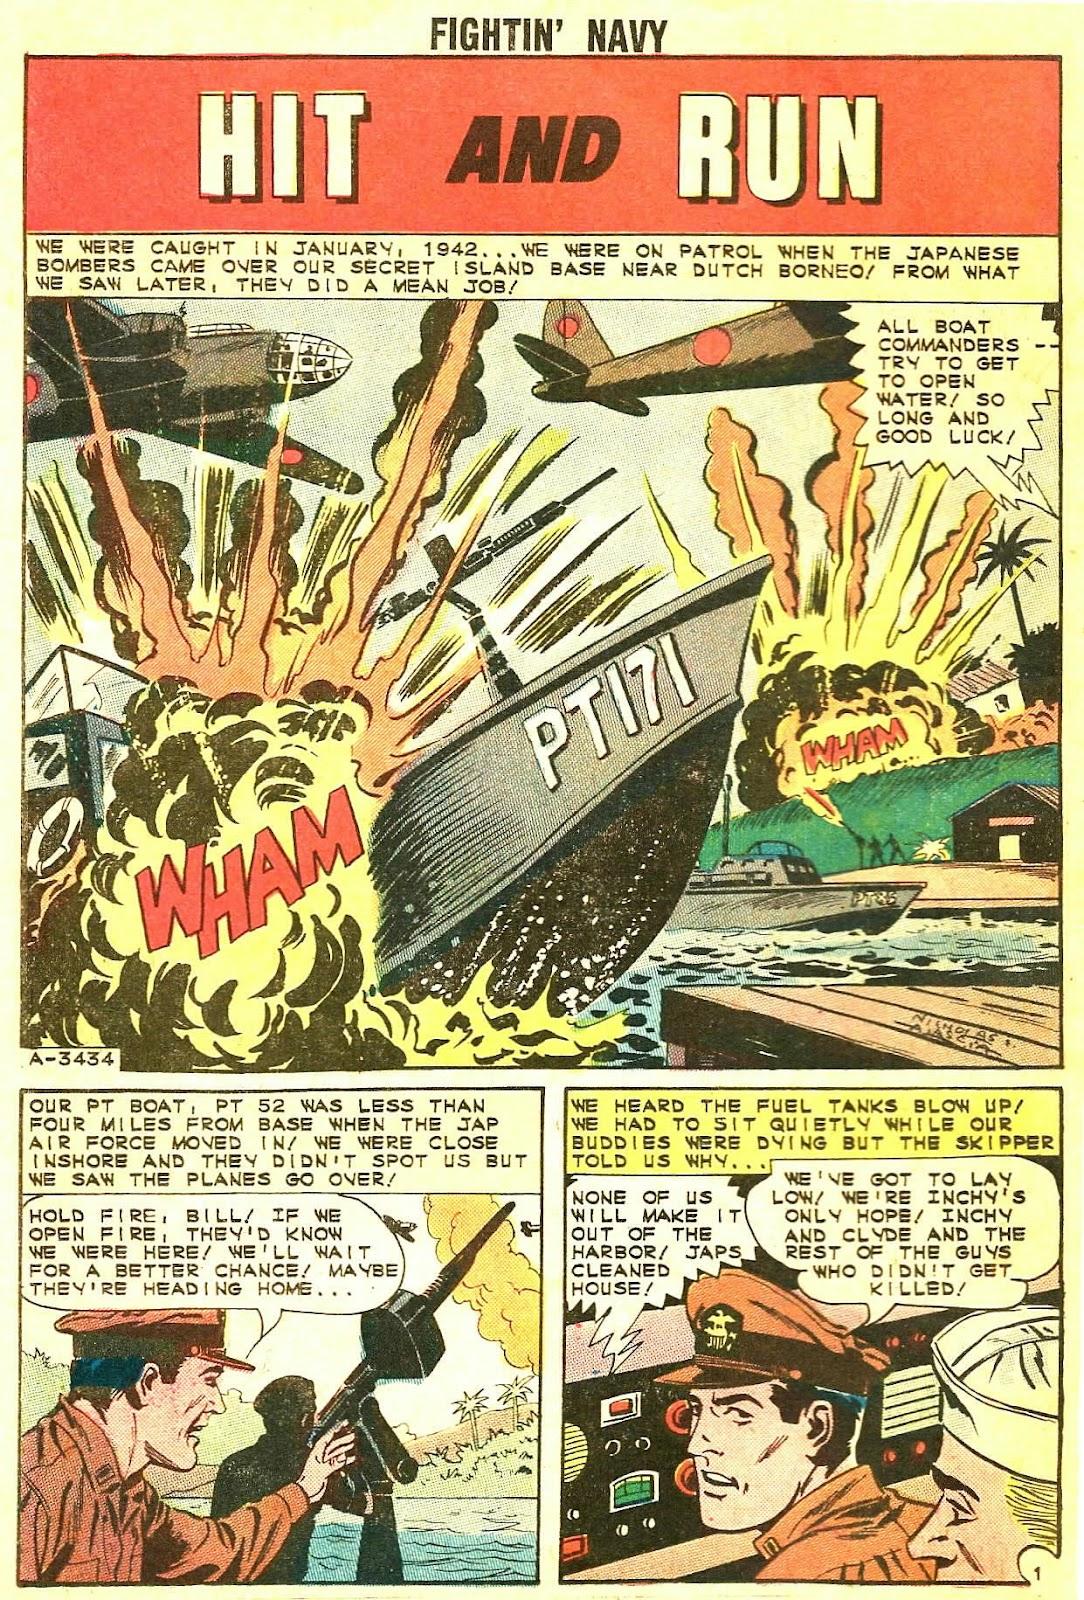 Read online Fightin' Navy comic -  Issue #115 - 26